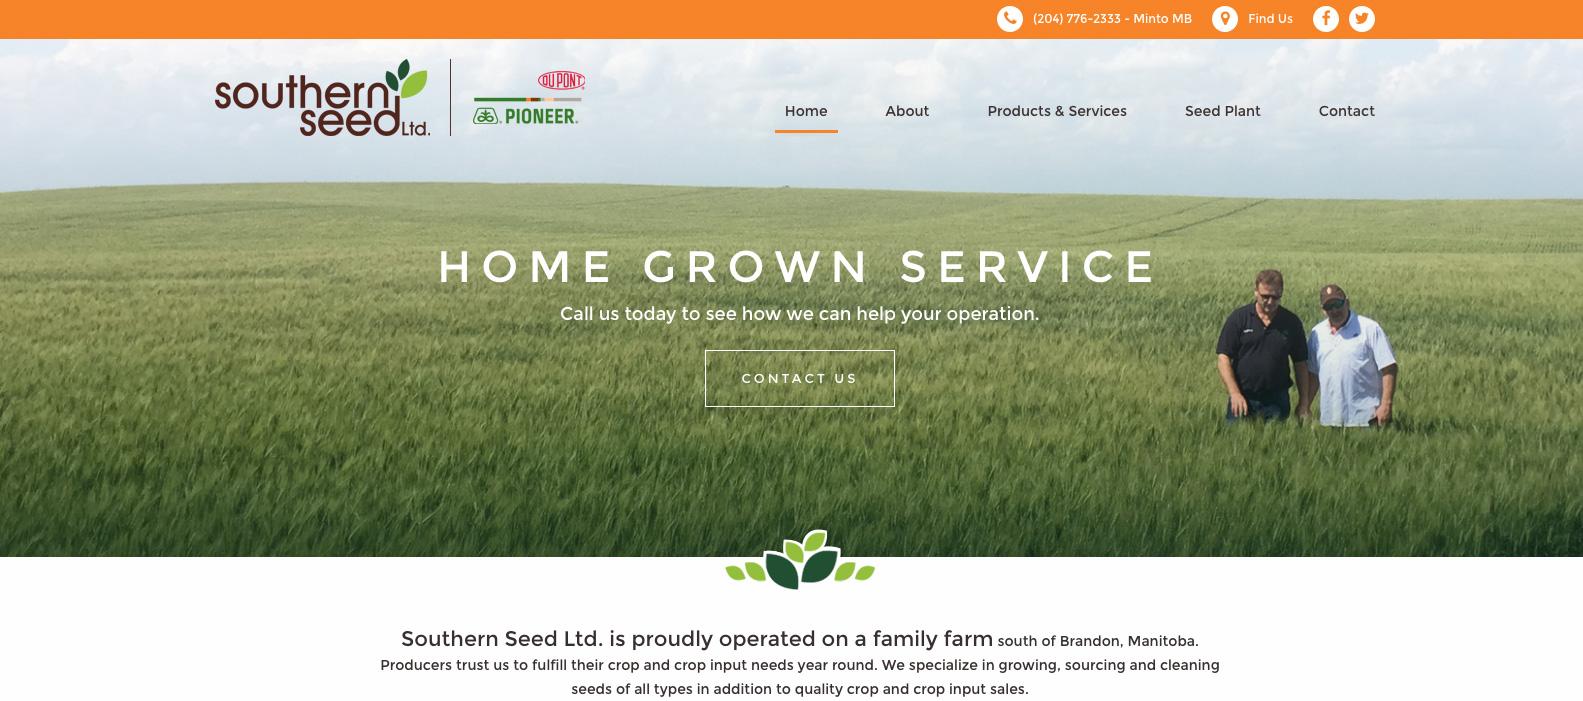 Southern Seeds, Manitoba, Web design